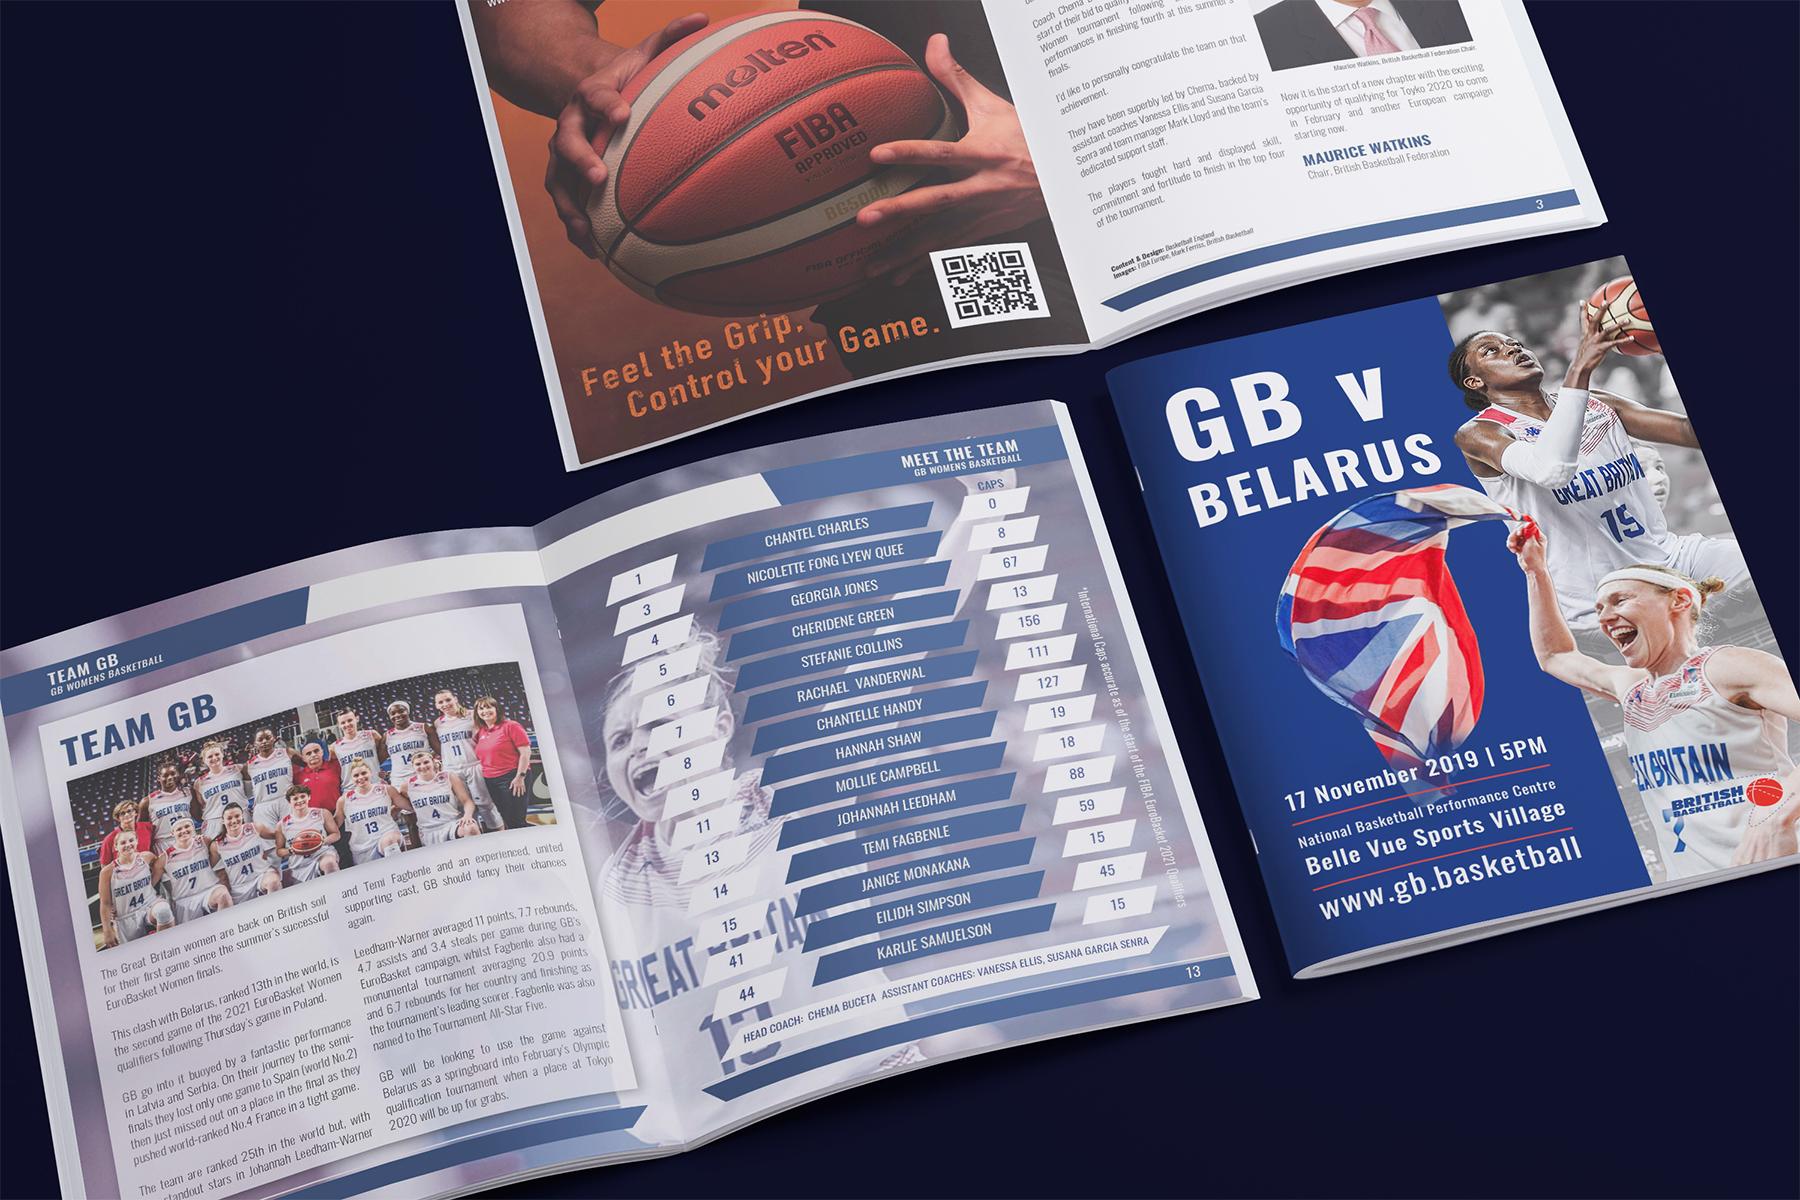 British Basketball programme GB vs Belarus